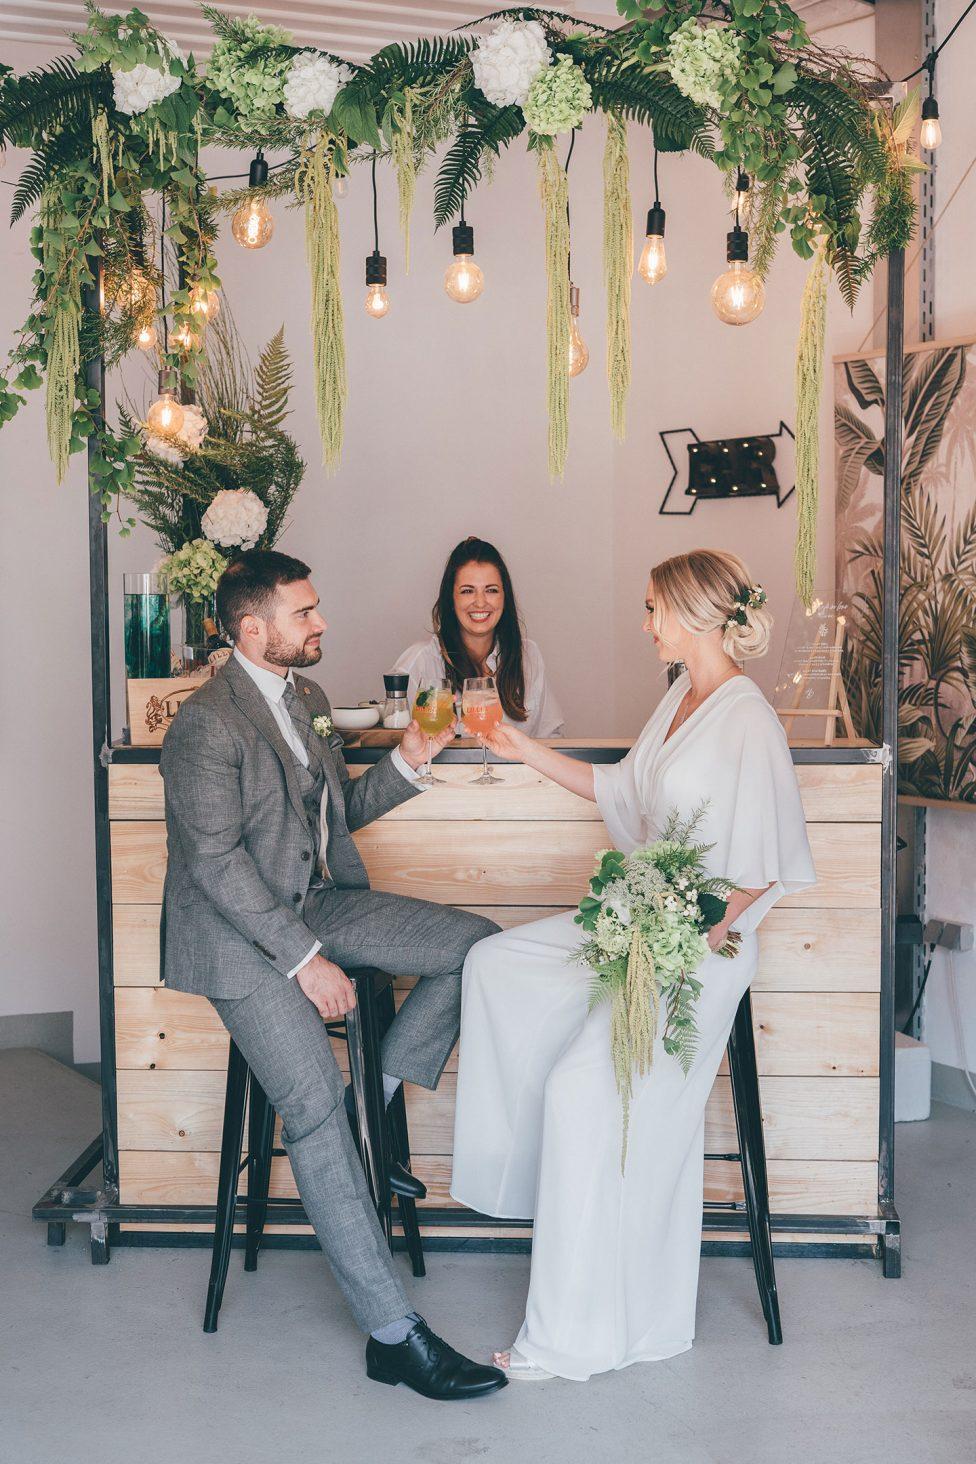 Top-Trend Hochzeitsmotto: Urban Greenery & Eco-friendly